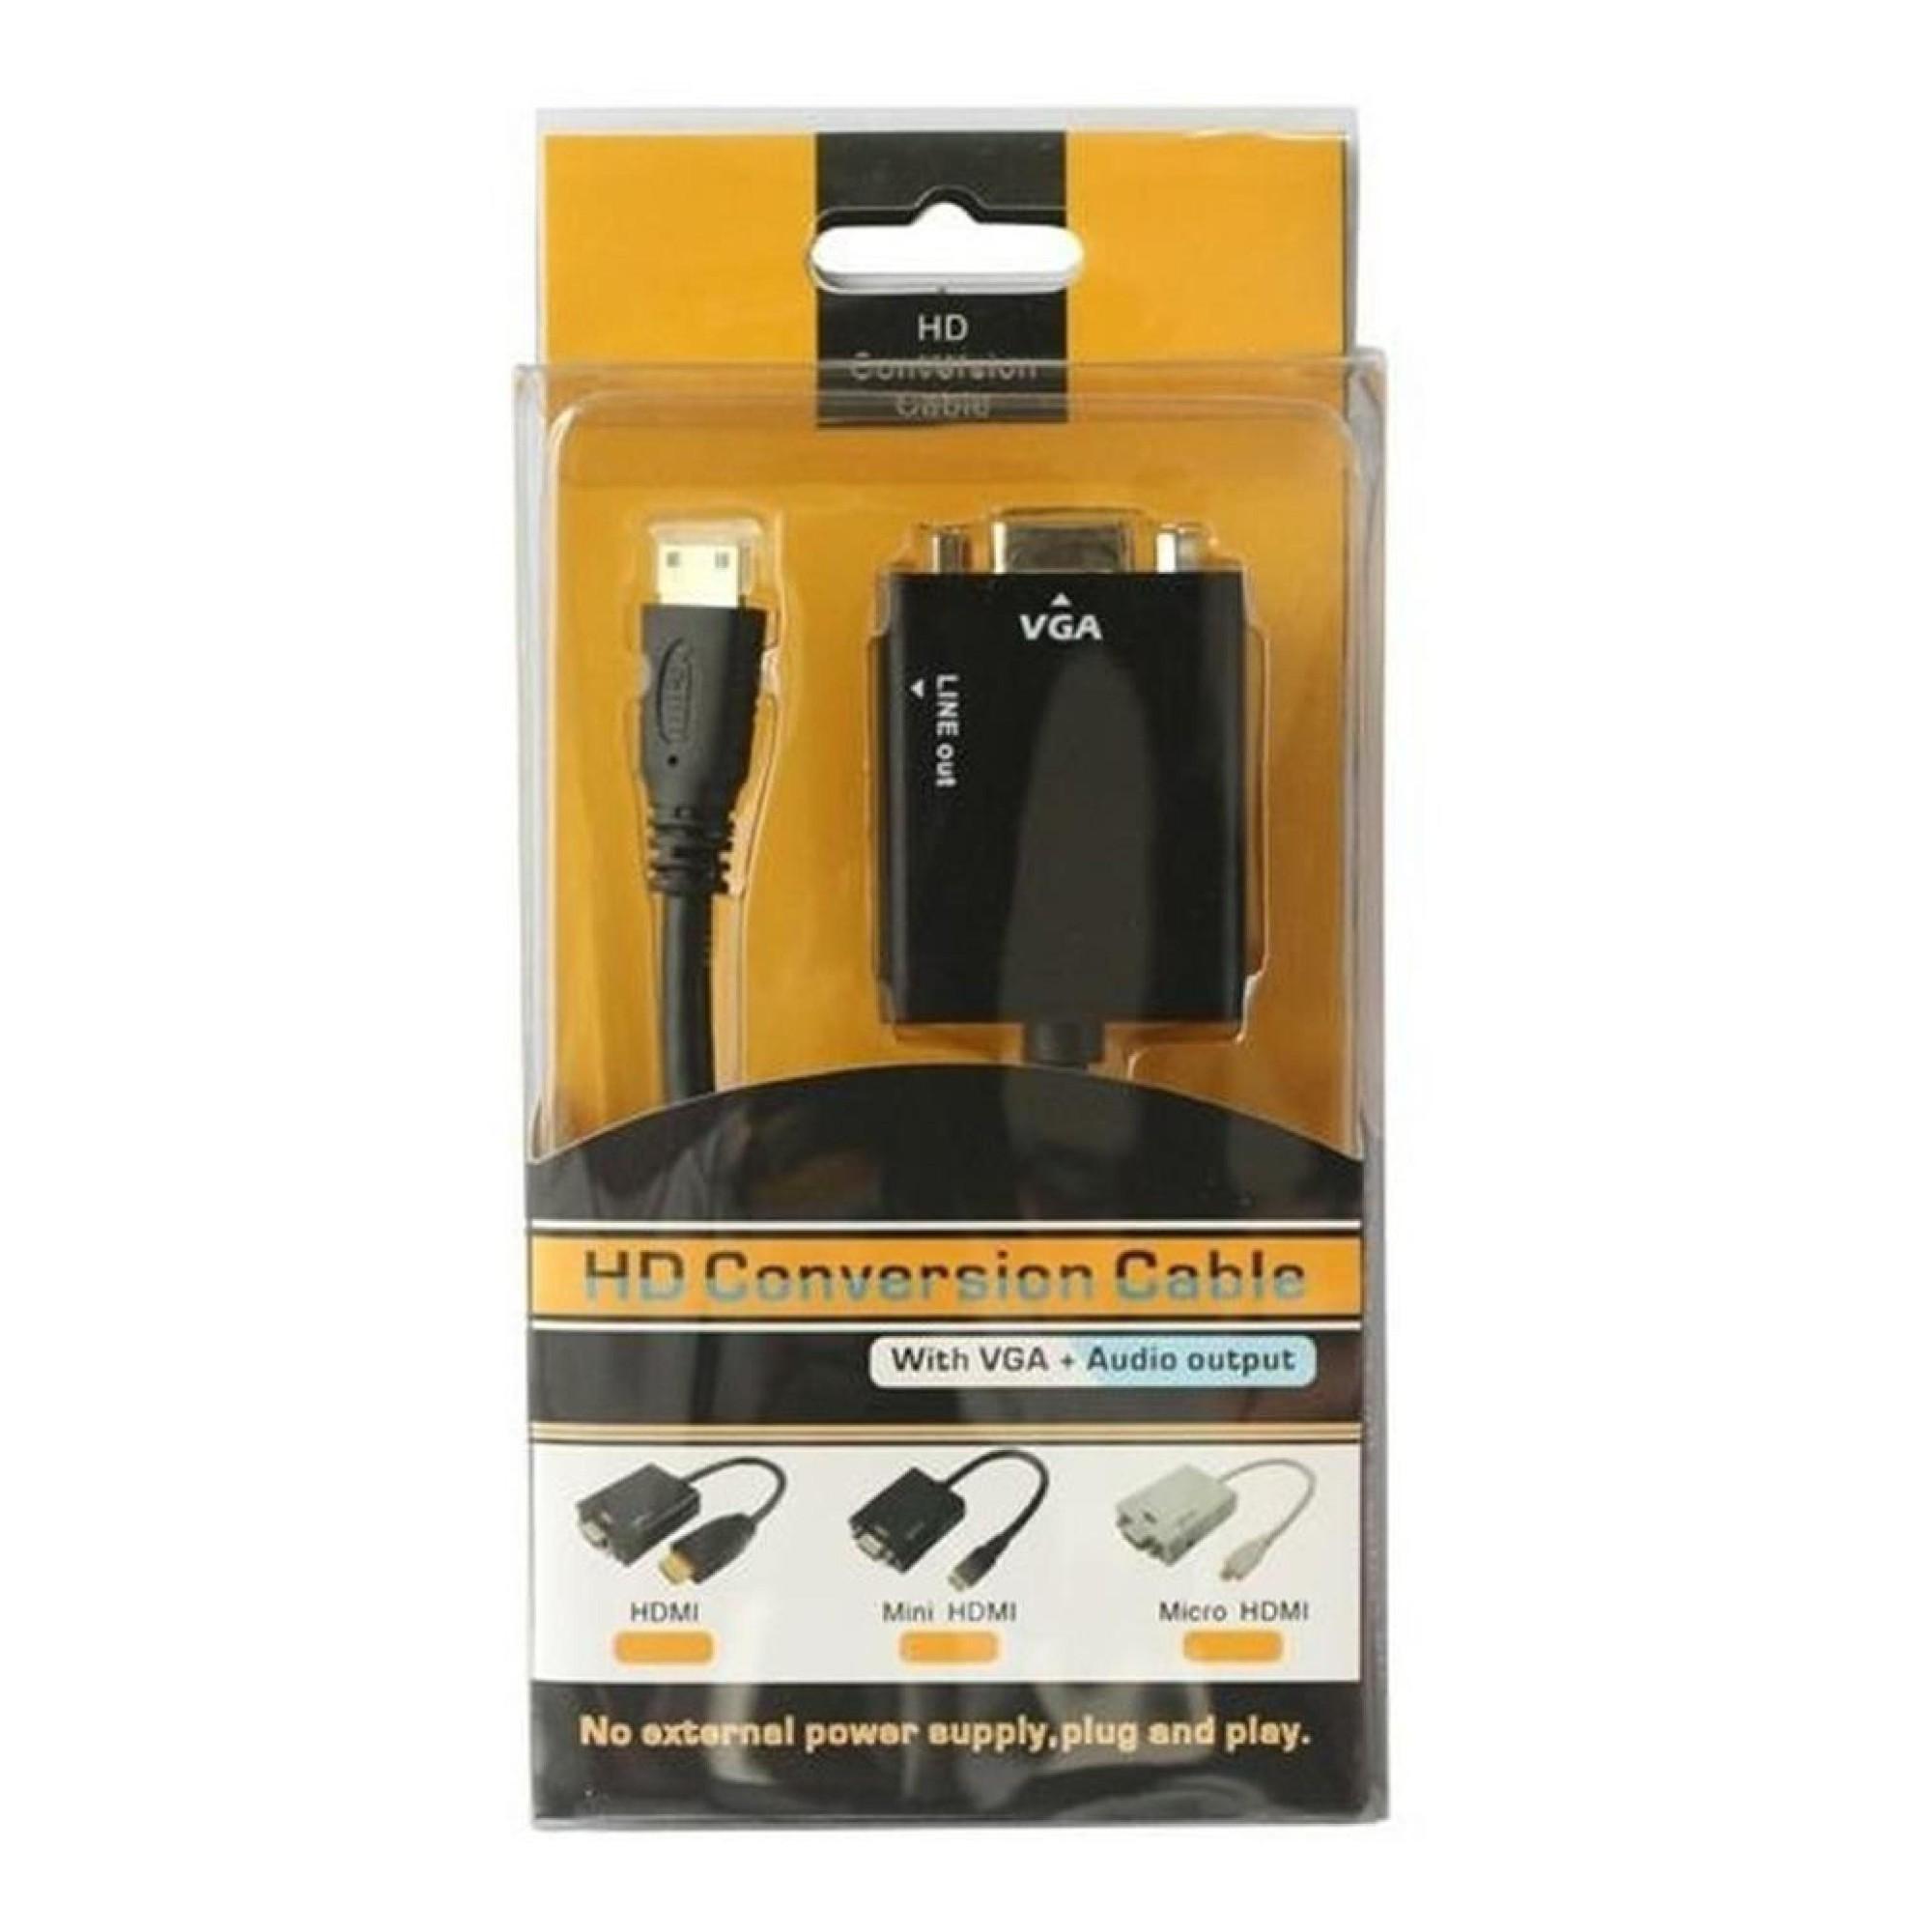 Conversor HDMI P/ VGA 1080p Full HD HDMI2VGA